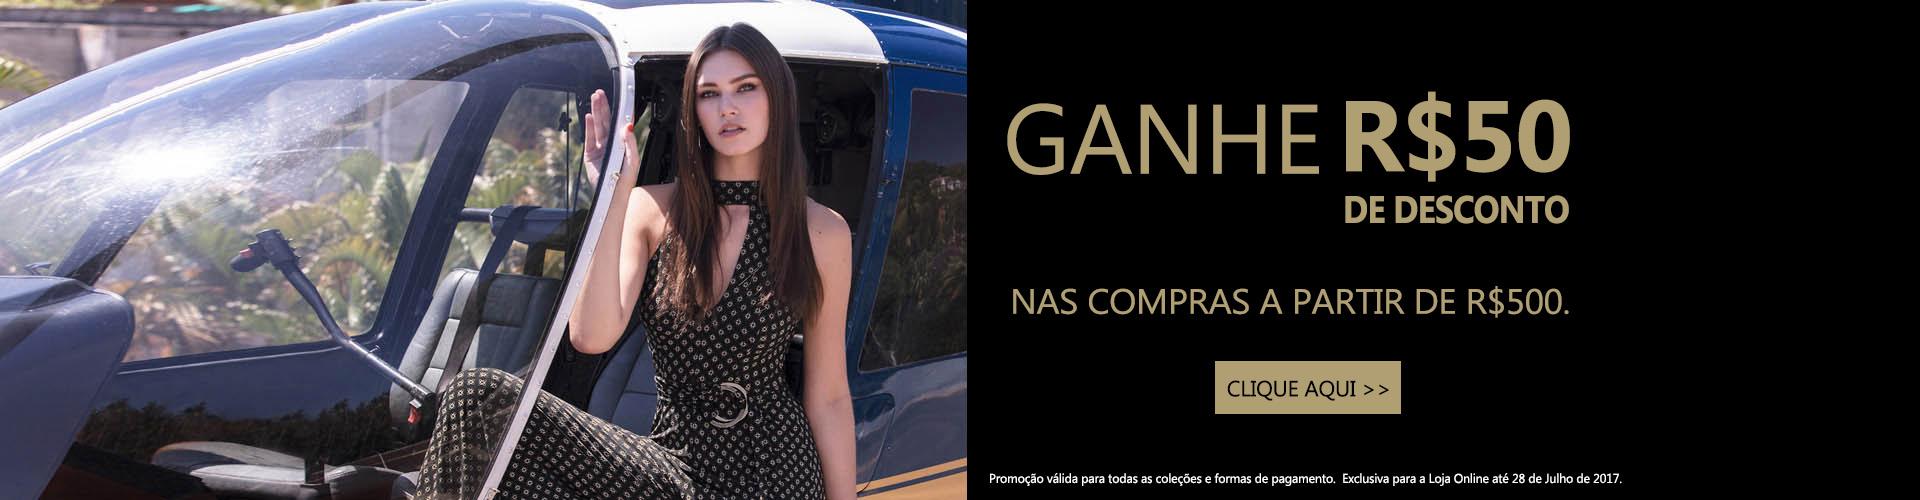 GANHA/GANHA